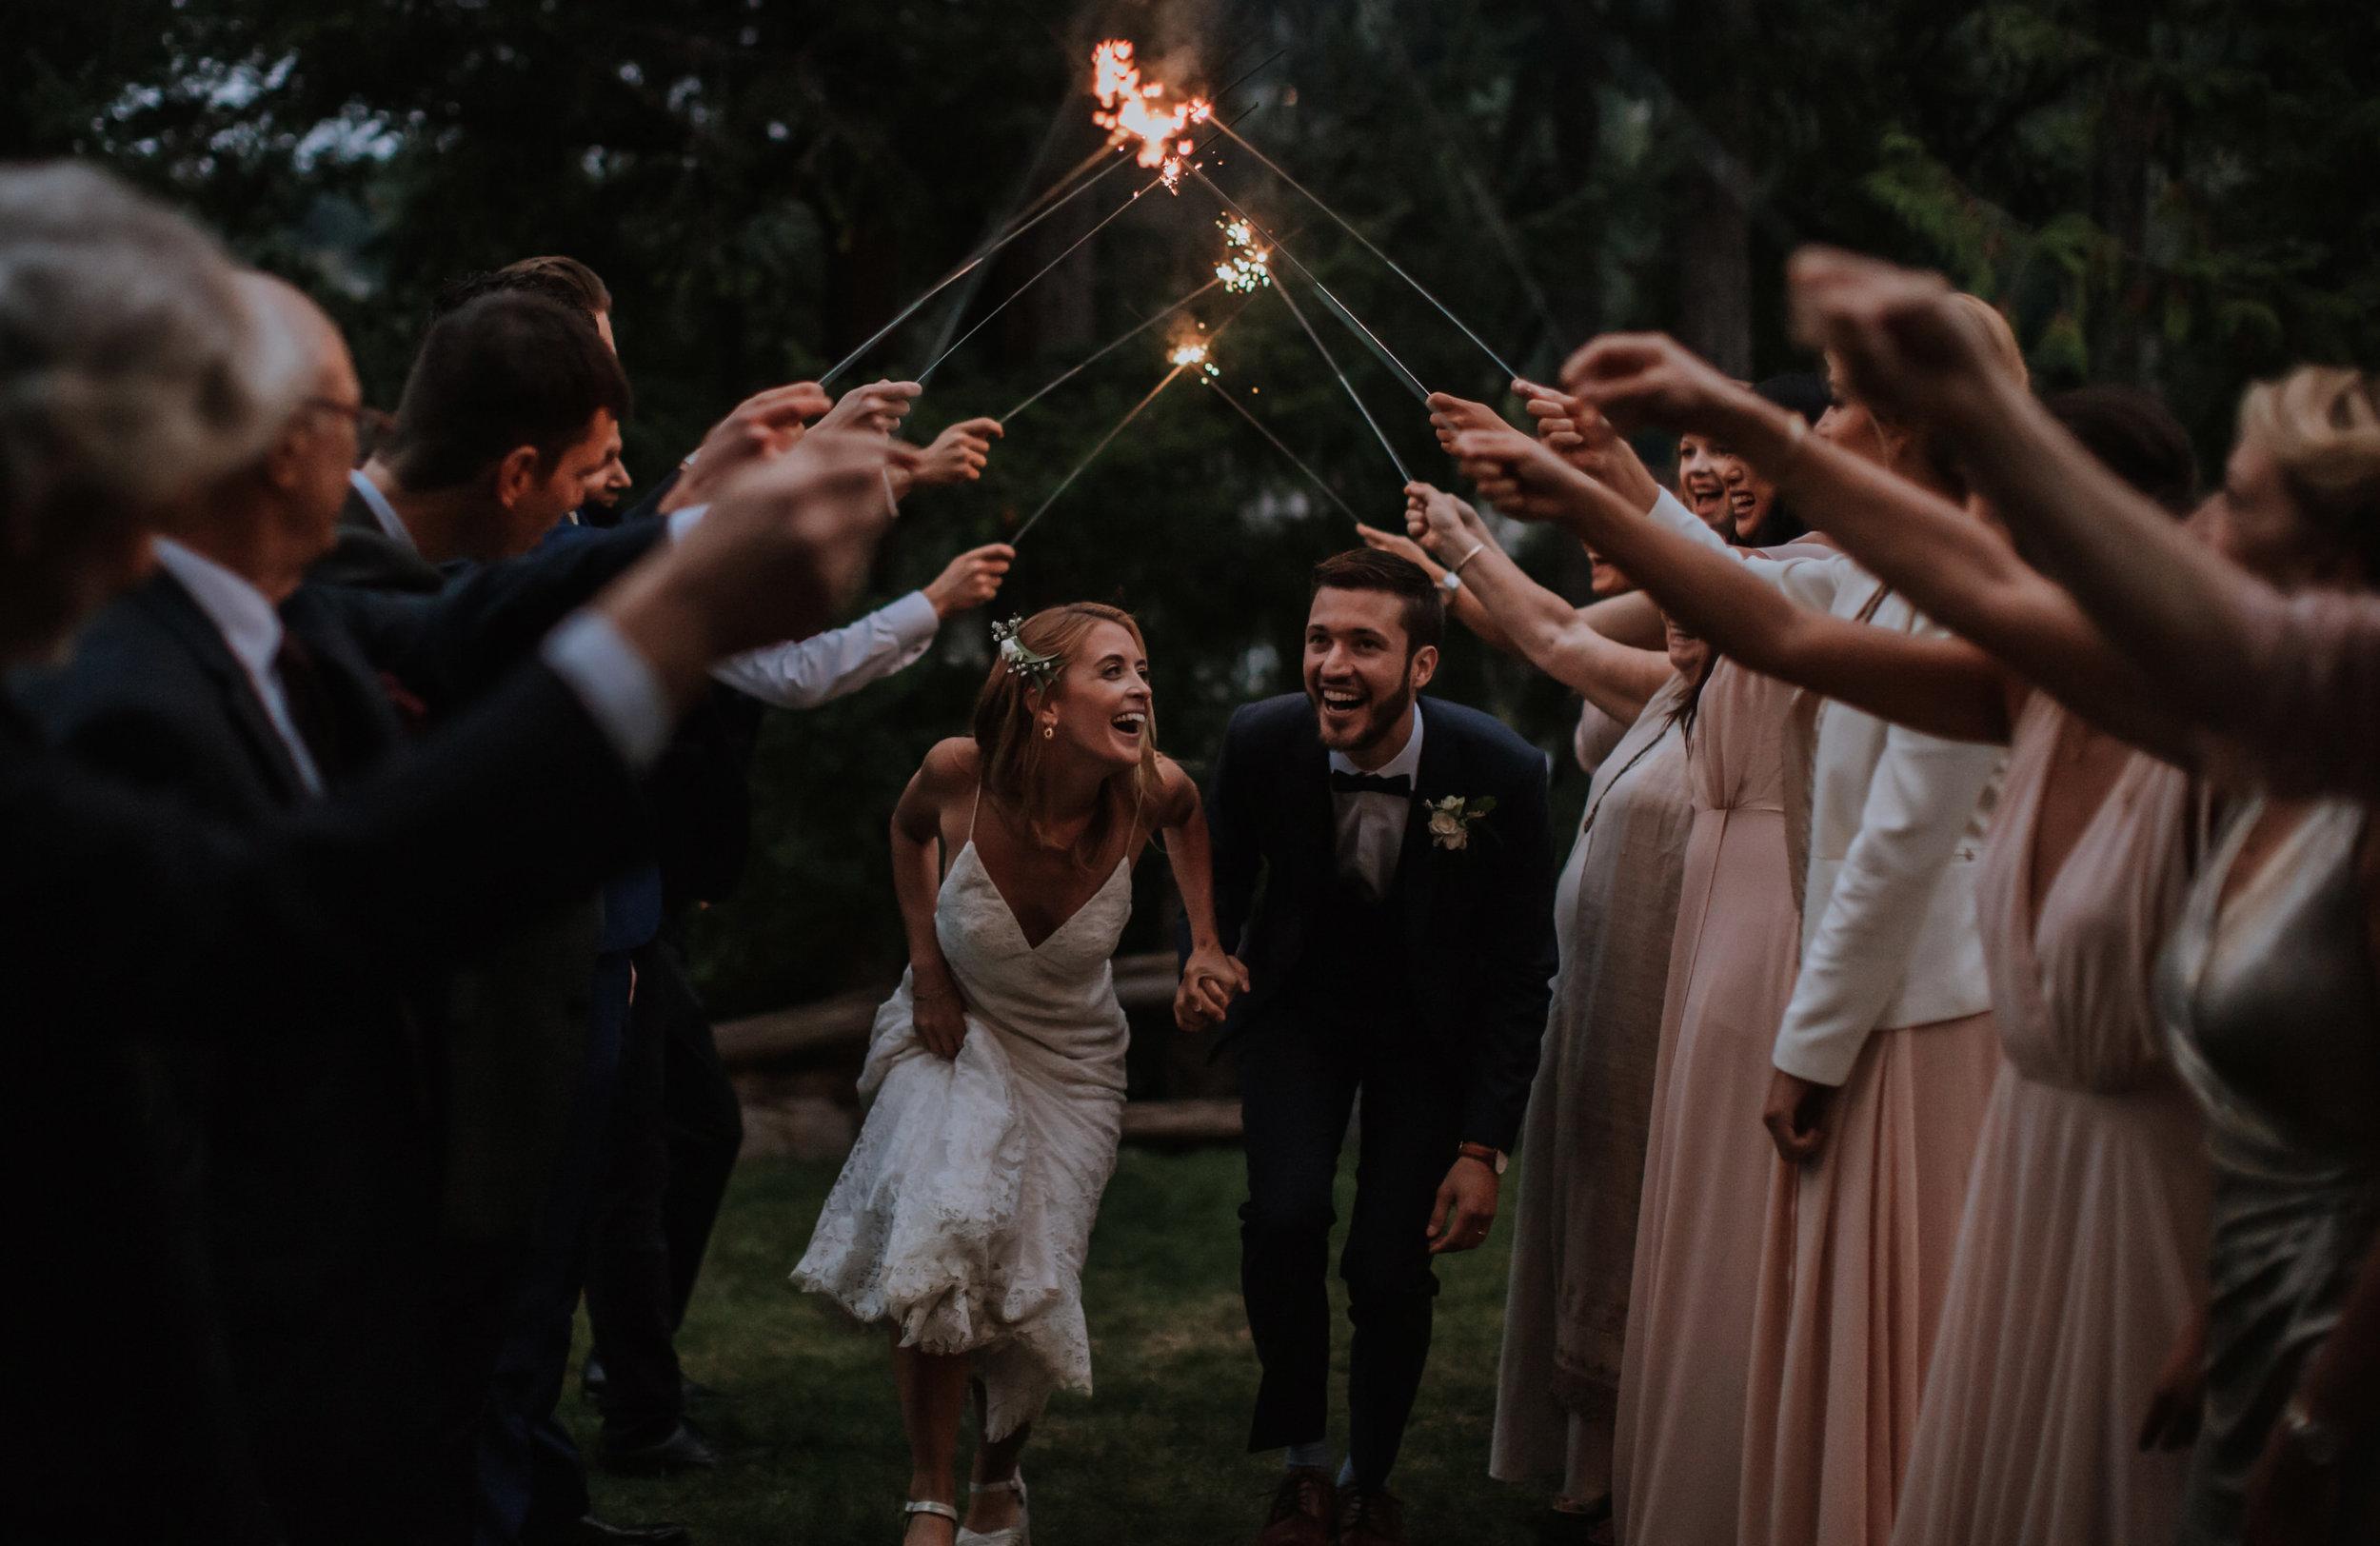 Vegan Wedding Photographer - Vancouver Wedding Photographer & Videographer - Sunshine Coast Wedding Photos - Sunshine Coast Wedding Photographer - Jennifer Picard Photography - IMG_0827.jpg